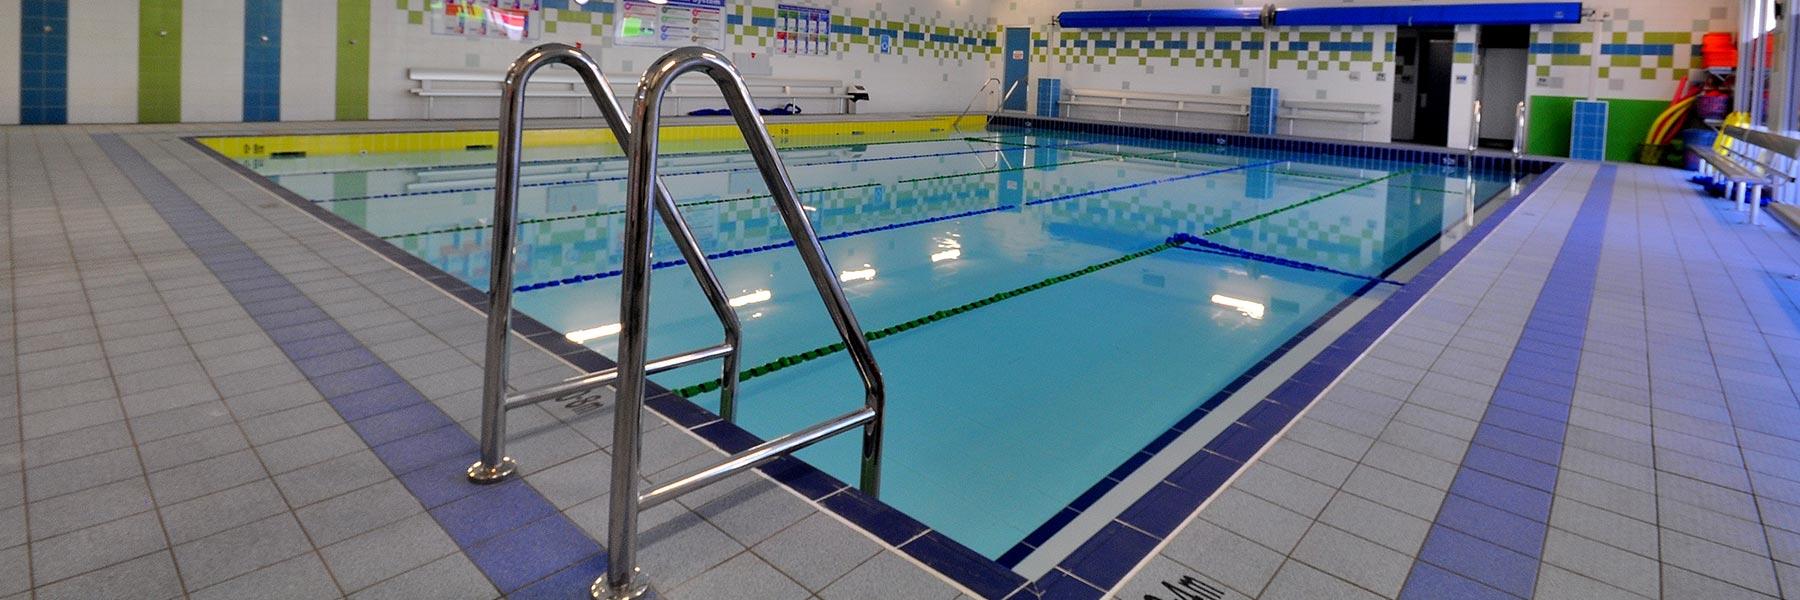 stateswim kwinana pool entry ladder